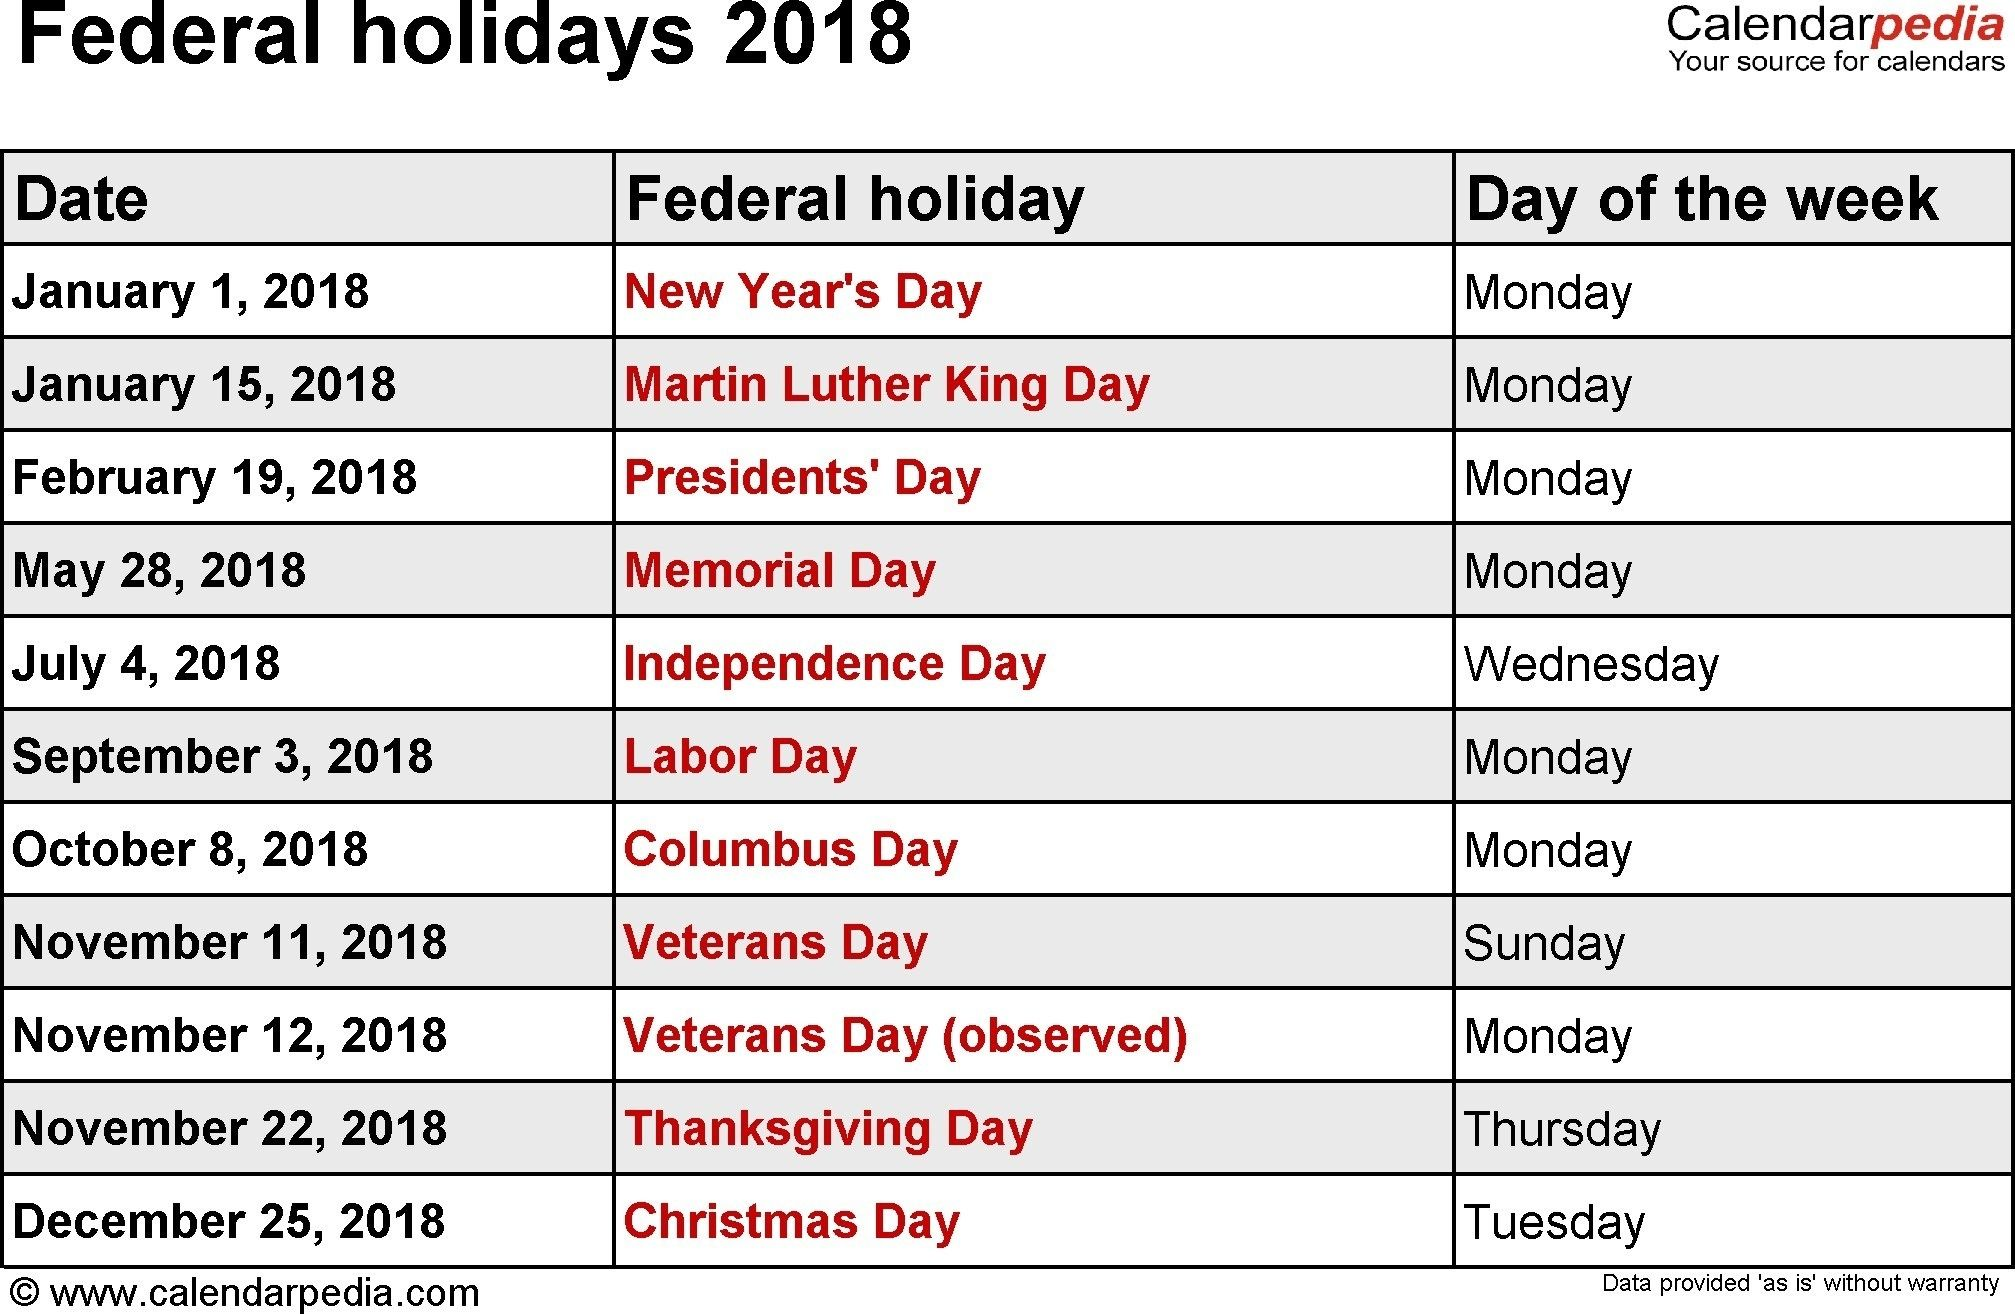 Gujarati Calendar 2019 Diwali Date Hindu Calendar 2018 Tithi Get Us Holiday Calendar Holiday Calendar Printable Holiday Calendar